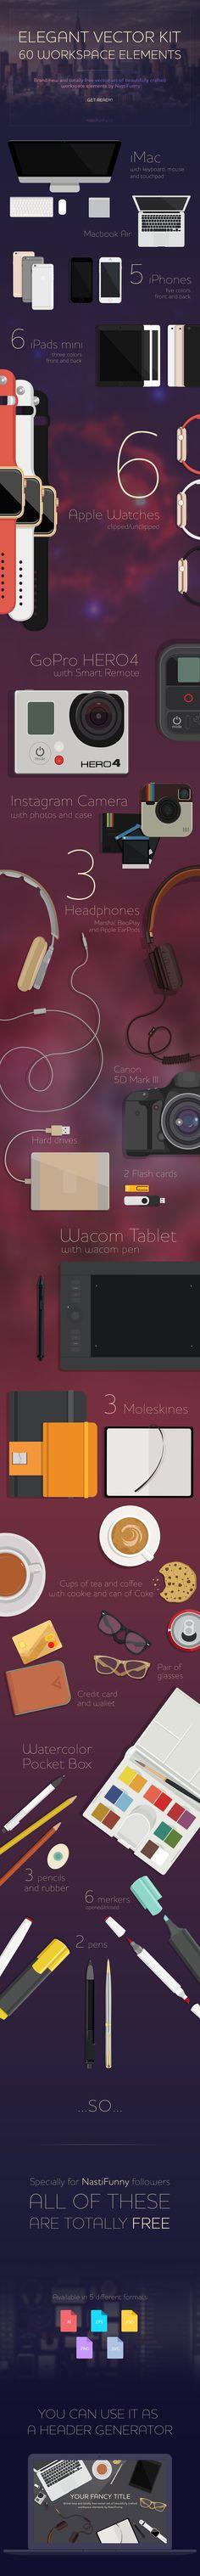 https://www.behance.net/gallery/26241257/FREE-Elegant-Vector-Kit-with-60-Workspace-Elements